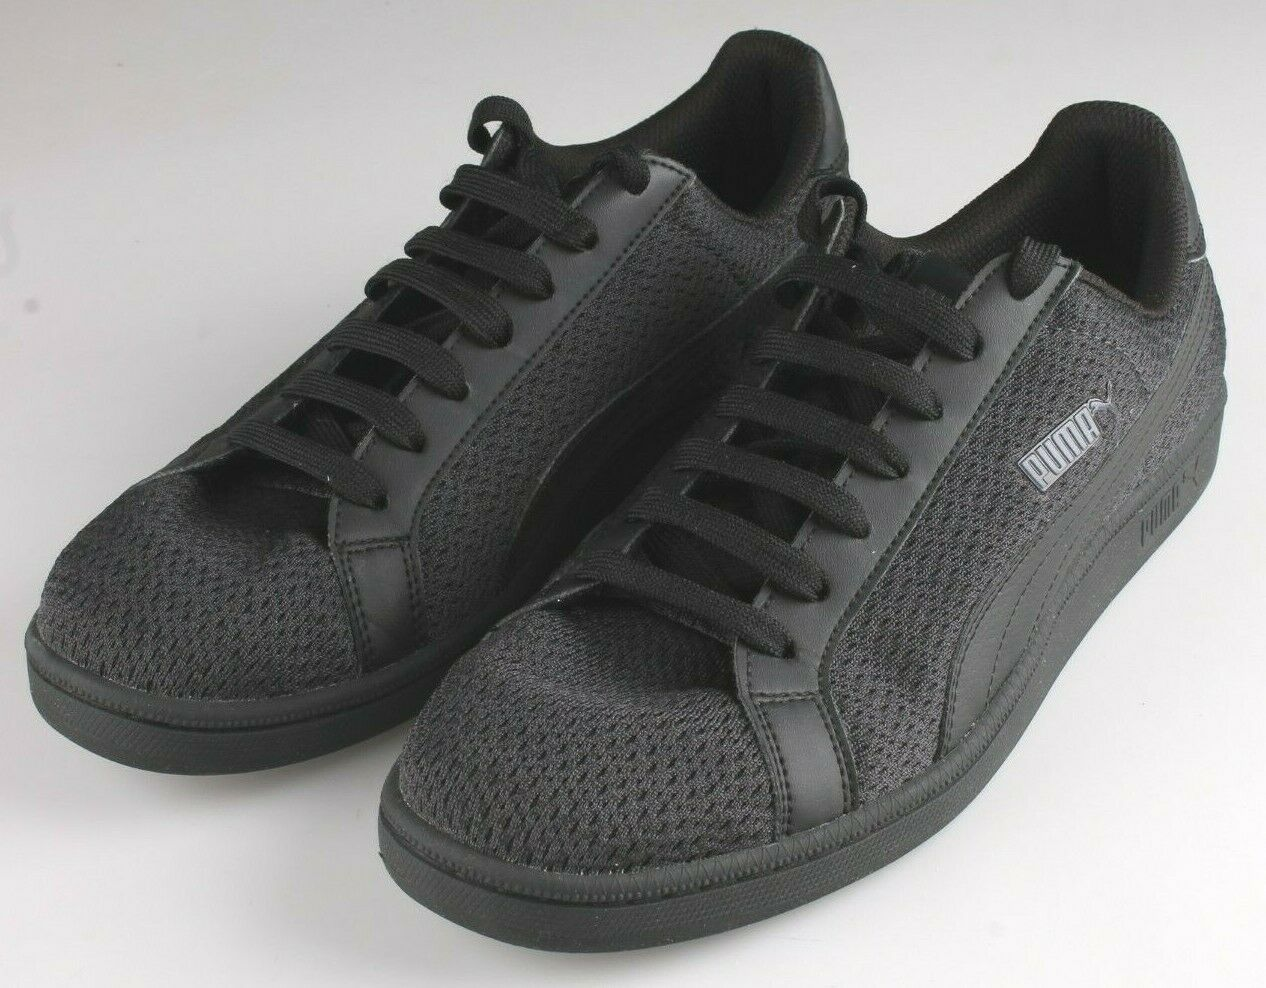 PUMA Men's Smash Knit C Black Casual Athletic Sneakers Gym Shoes